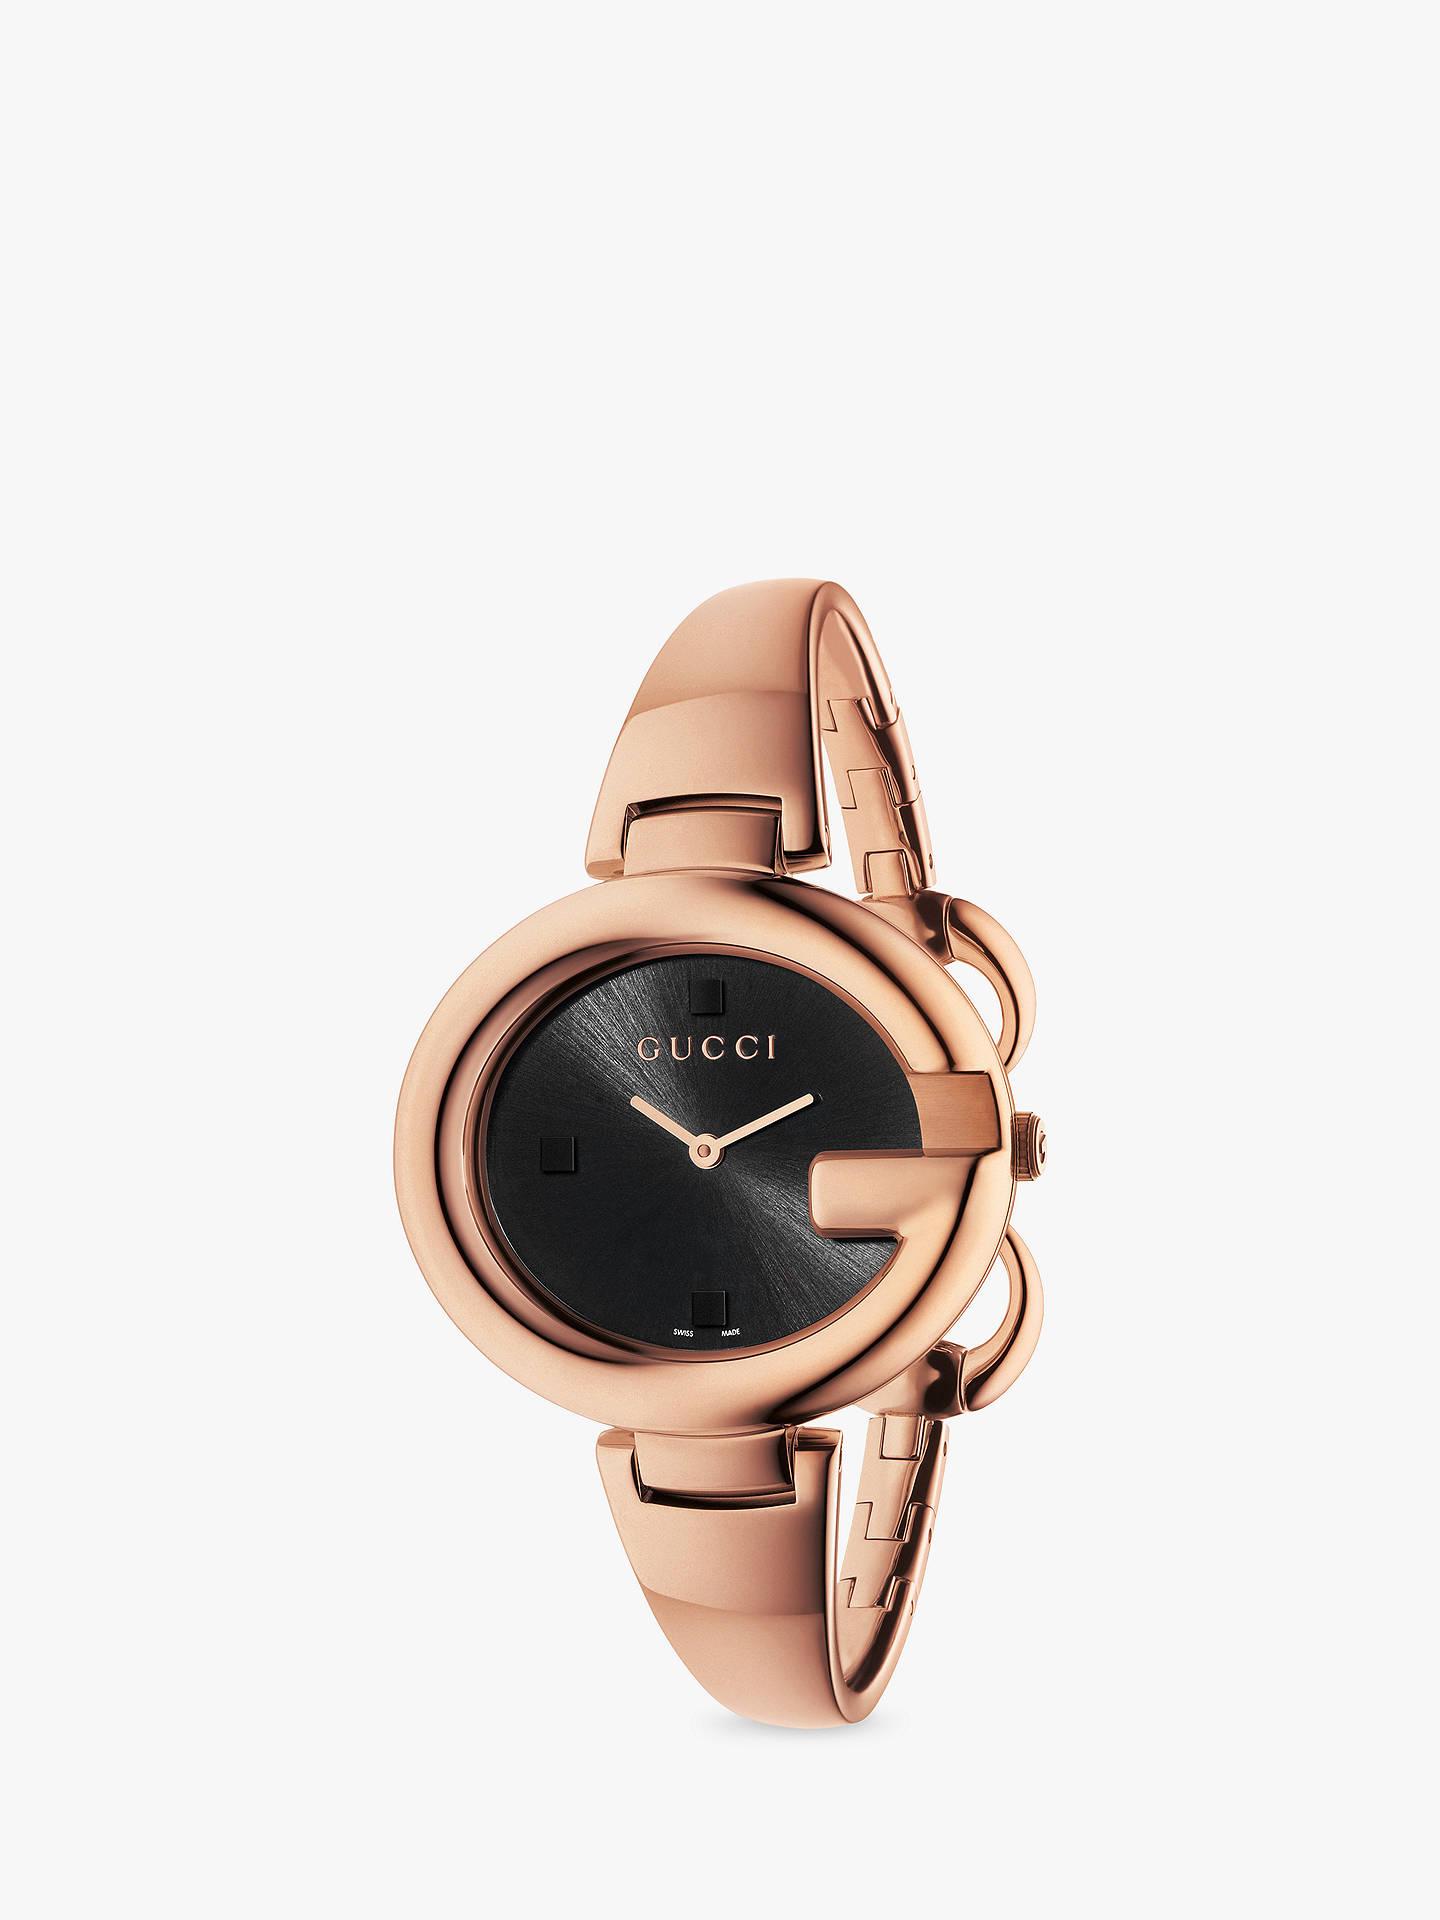 17209b886c630 Gucci YA134305 Women's Guccissima Bangle Strap Watch, Rose Gold/Black